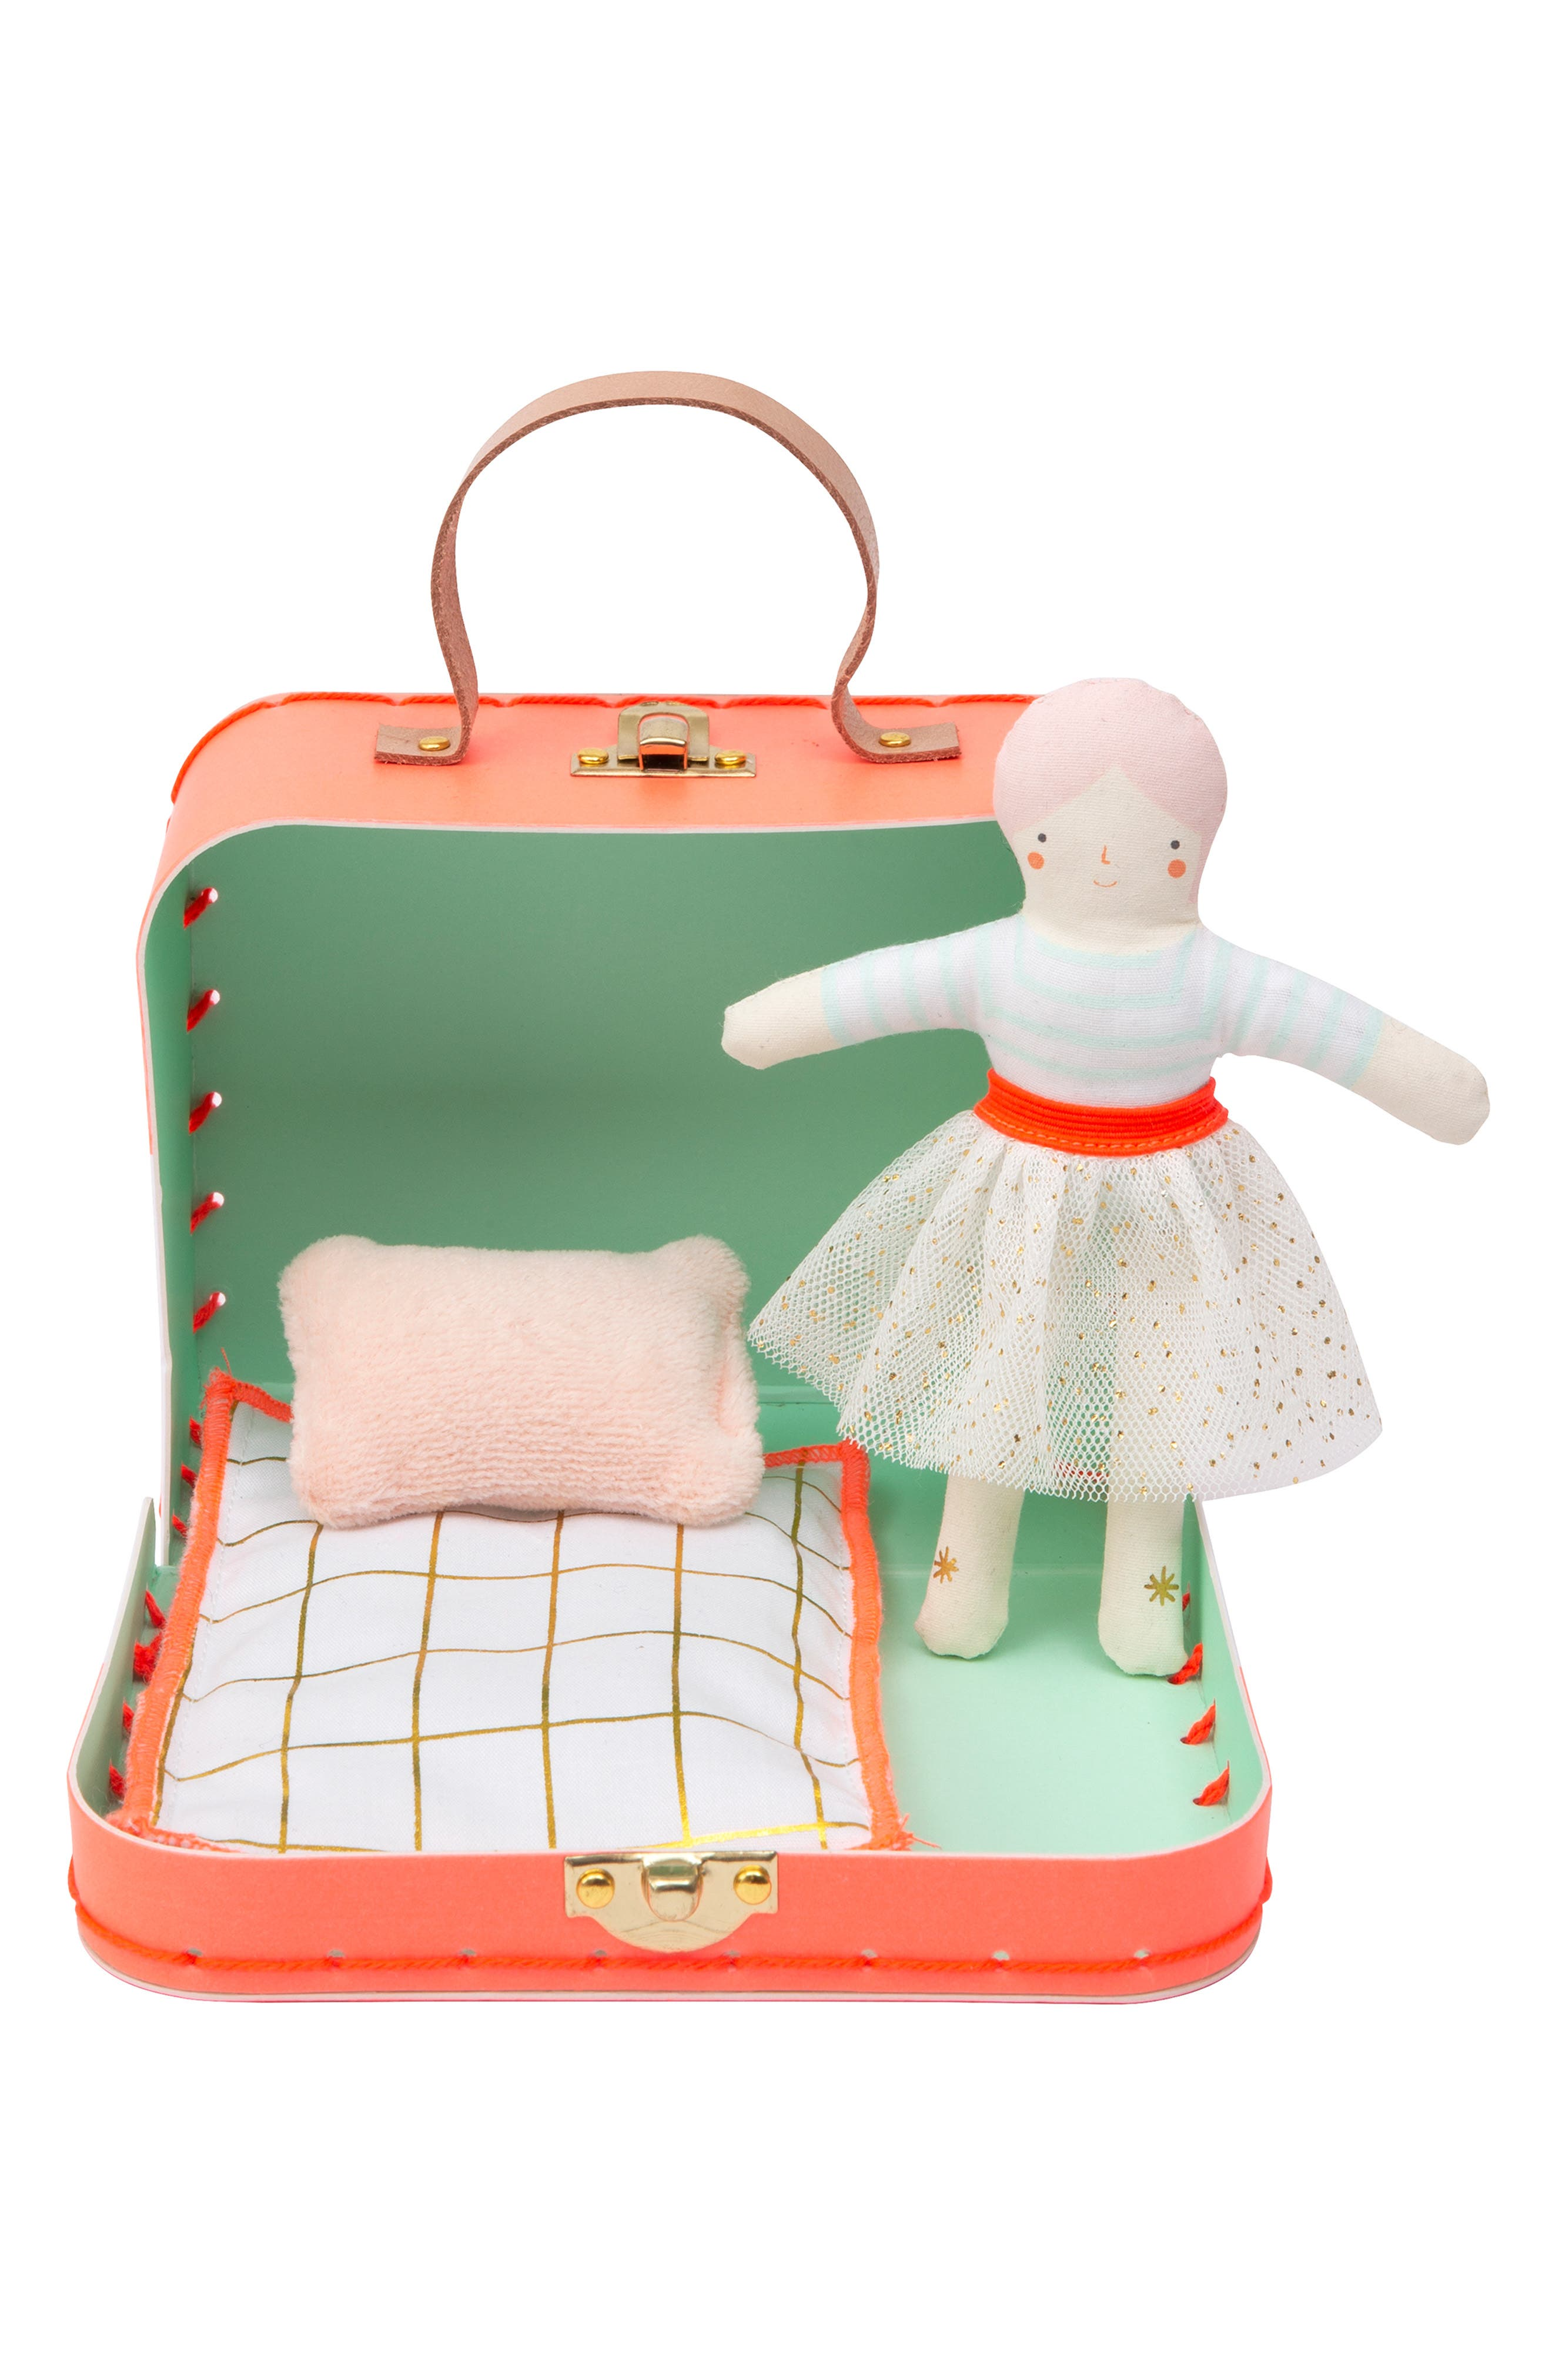 Girls Meri Meri Mini Matilda Doll  Suitcase Set